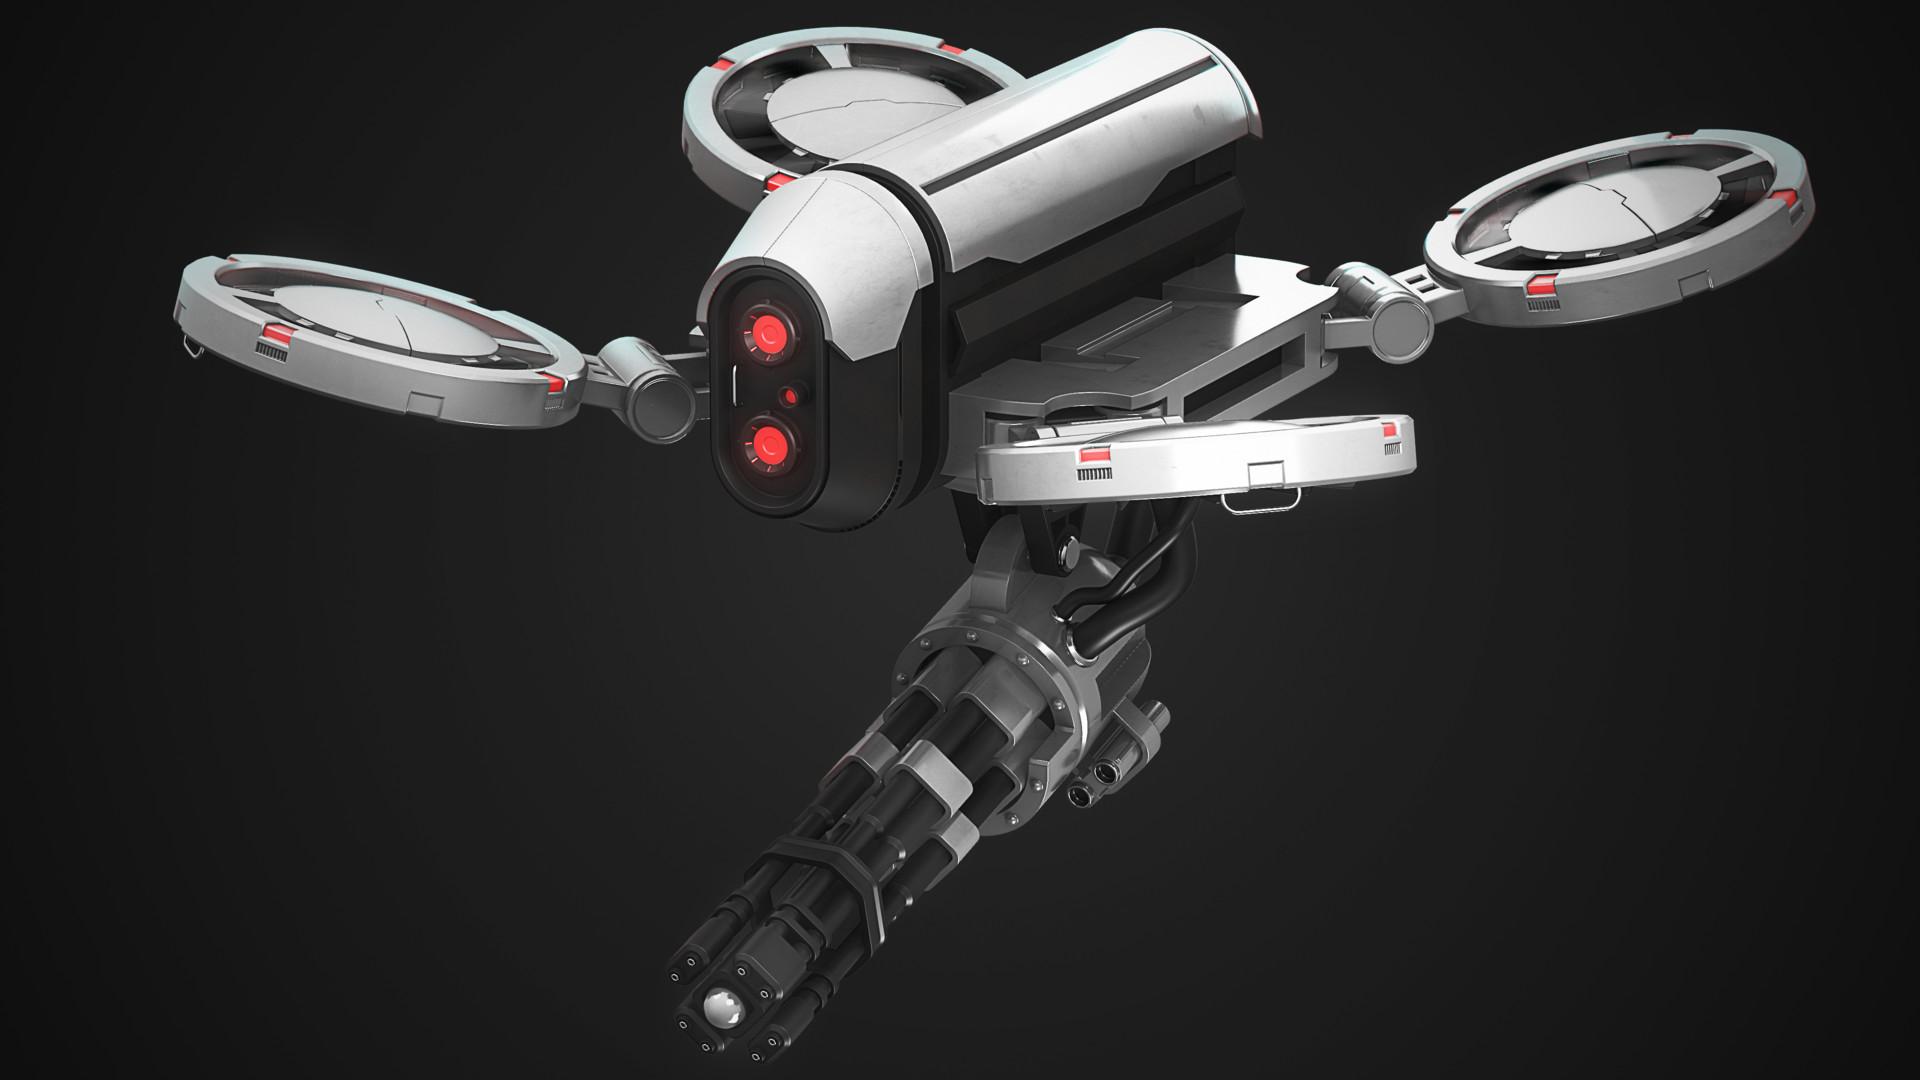 gregori-vorontsov-drone-01.jpg?151570420